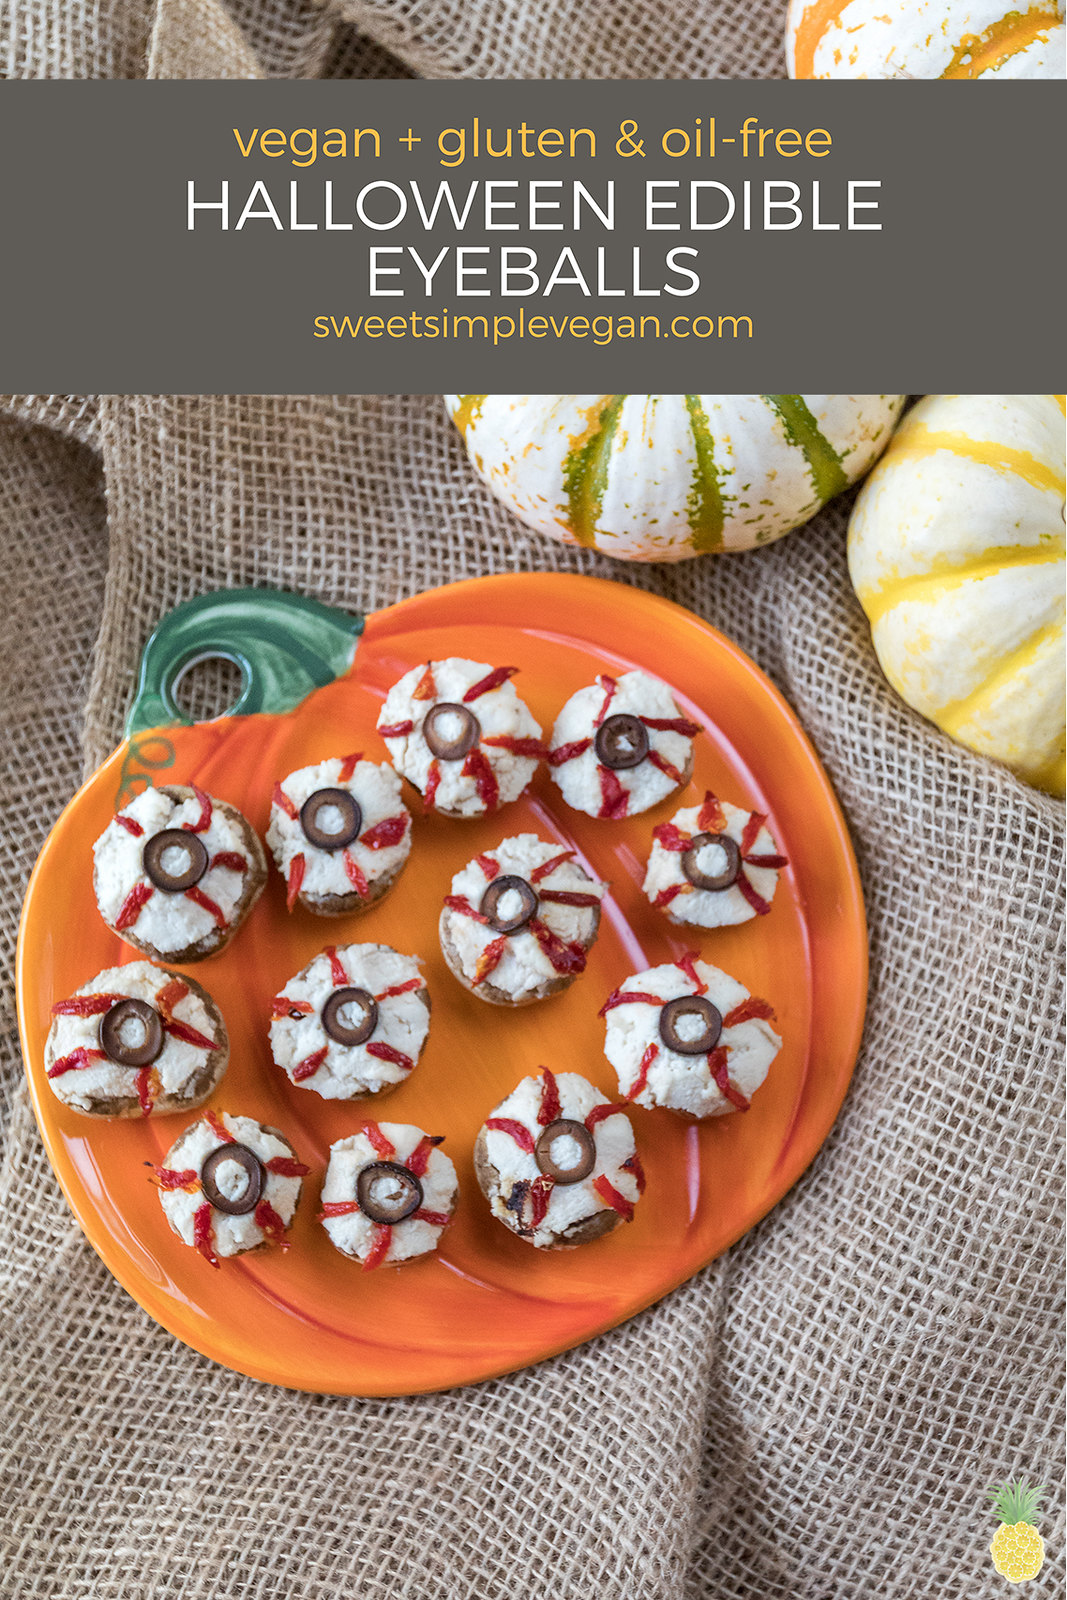 Halloween Edible Eyeballs: Vegan Ricotta Stuffed Mushrooms {4-Ingredients, Oil & Gluten-free} sweetsimplevegan.com